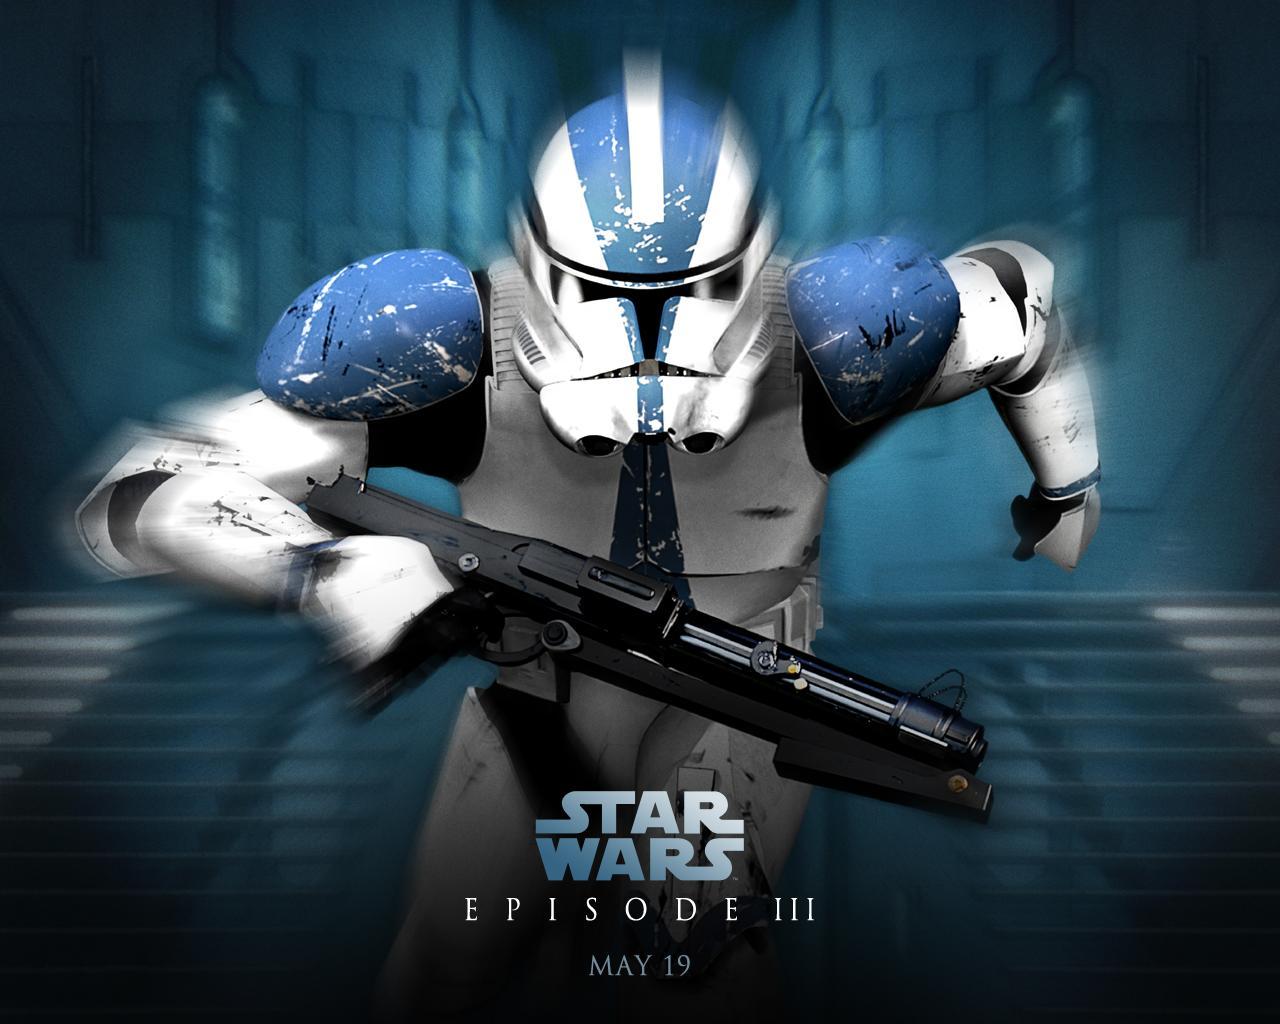 Free Download Star Wars Clone Trooper Wallpaper 02